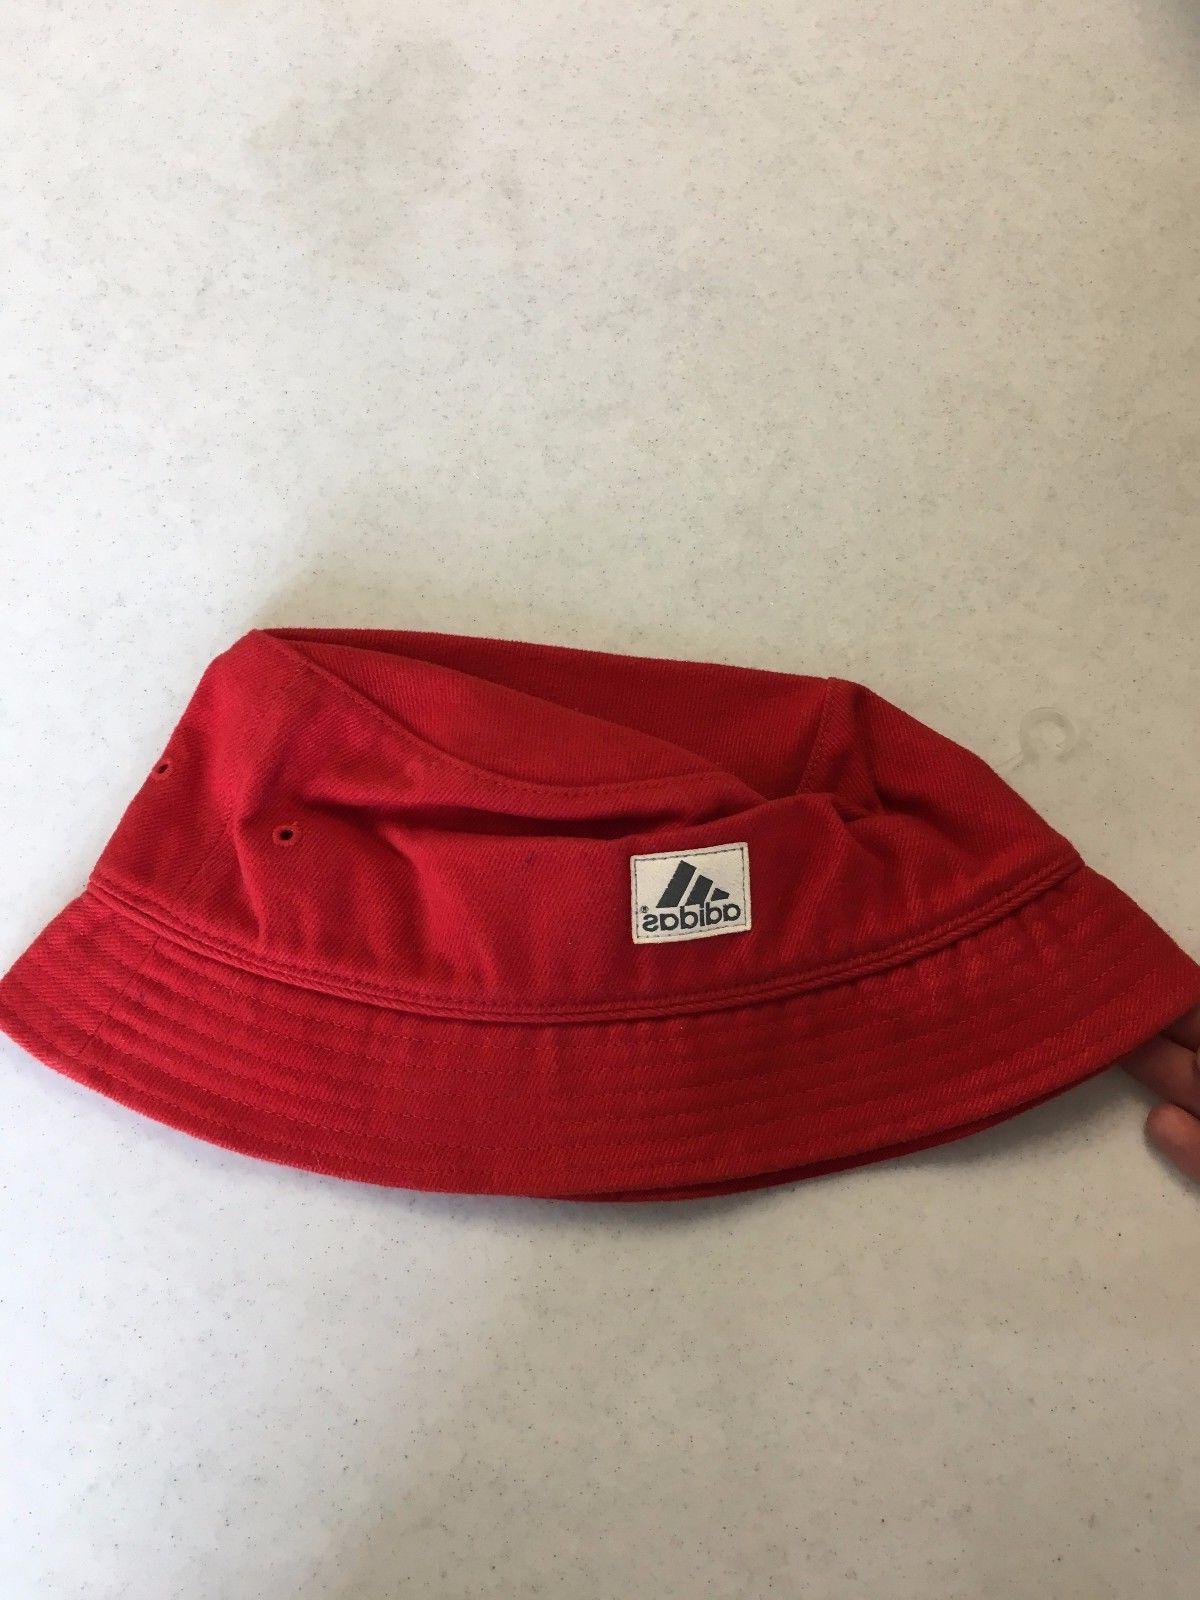 BRAND ADIDAS RED SQUARE HAT SMALL/MEDIUM